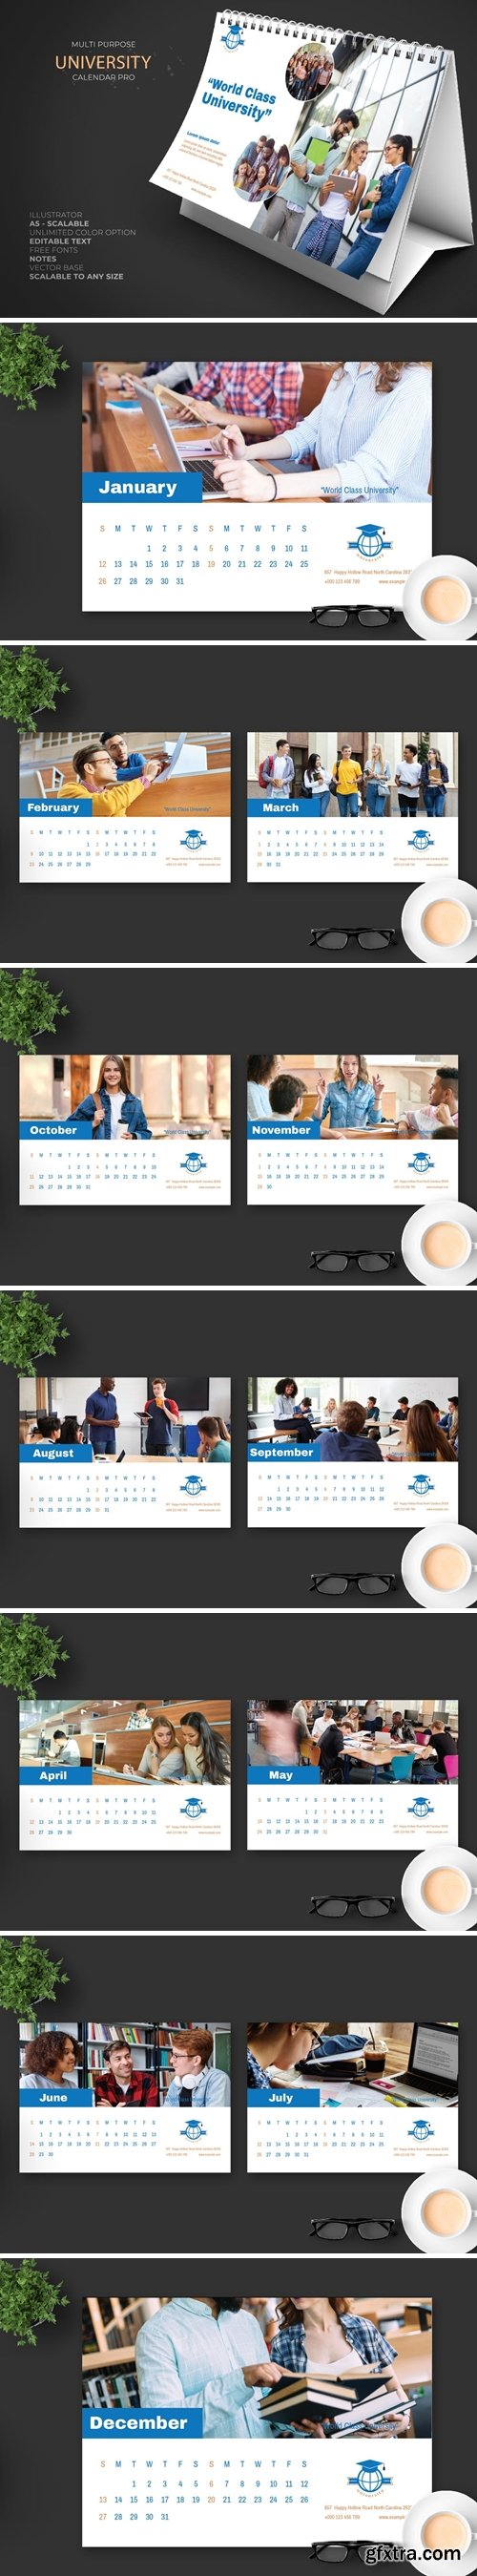 2020 University Calendar Pro